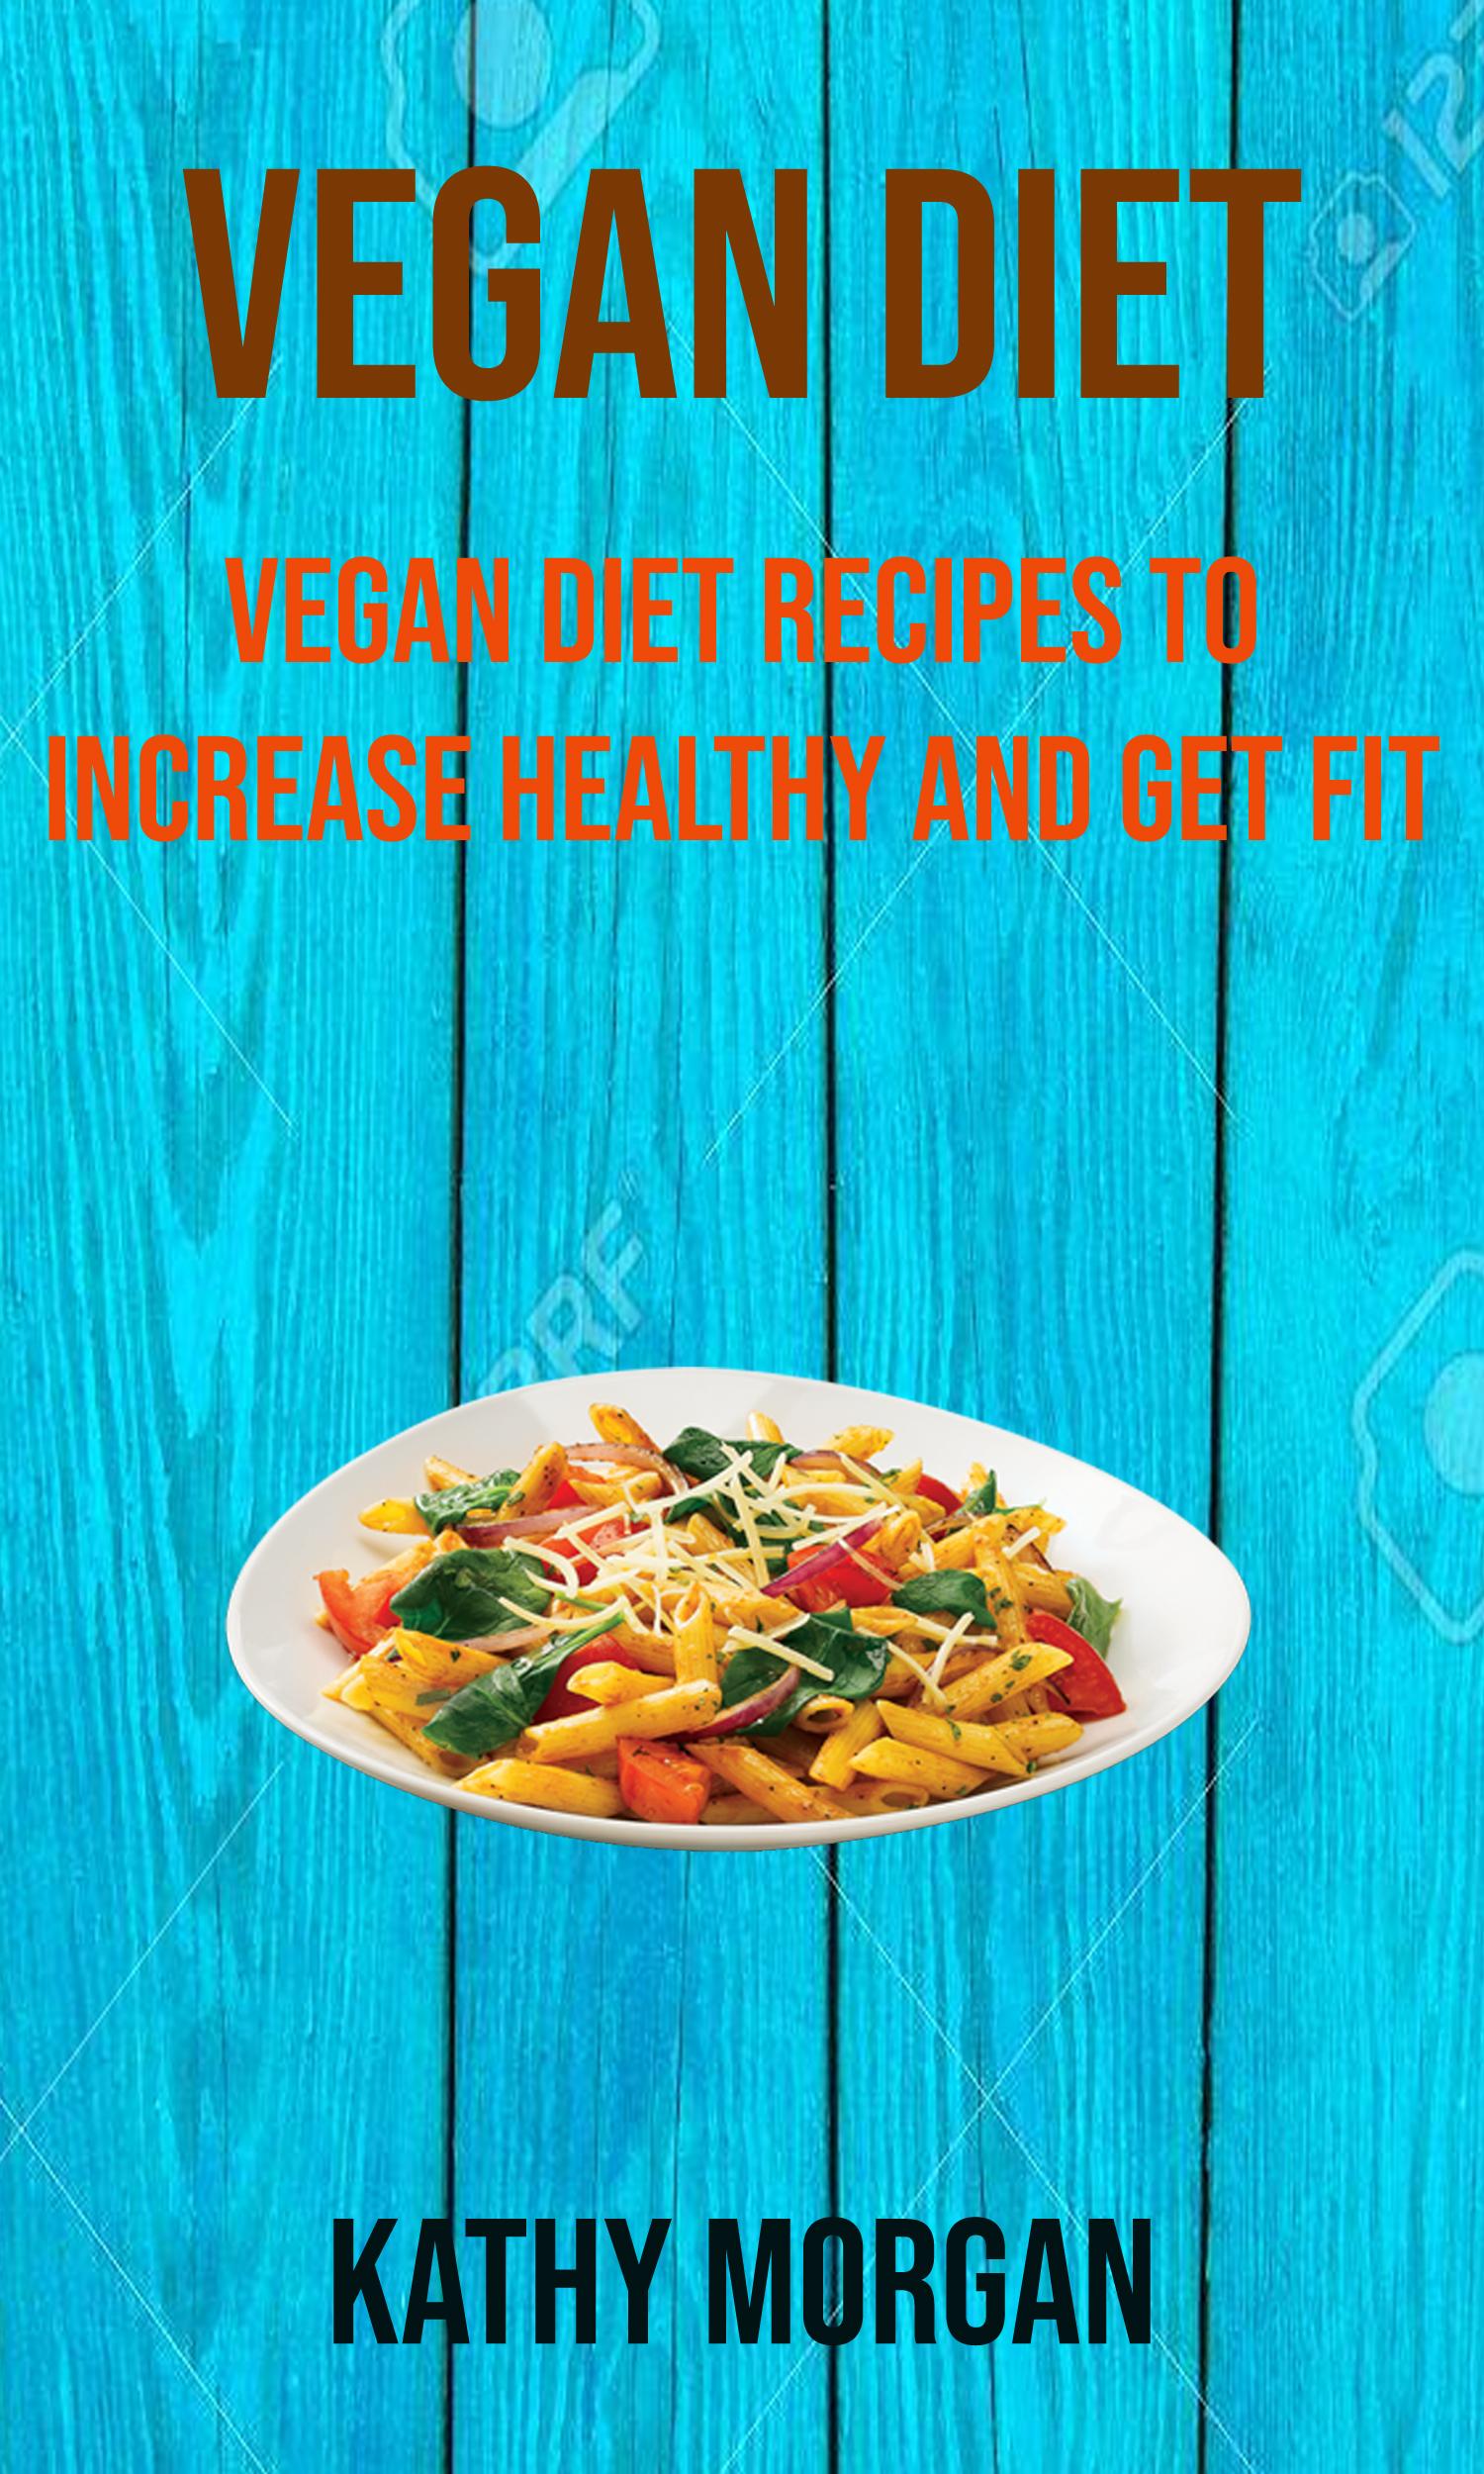 Vegan diet: vegan diet recipes to increase healthy and get fit